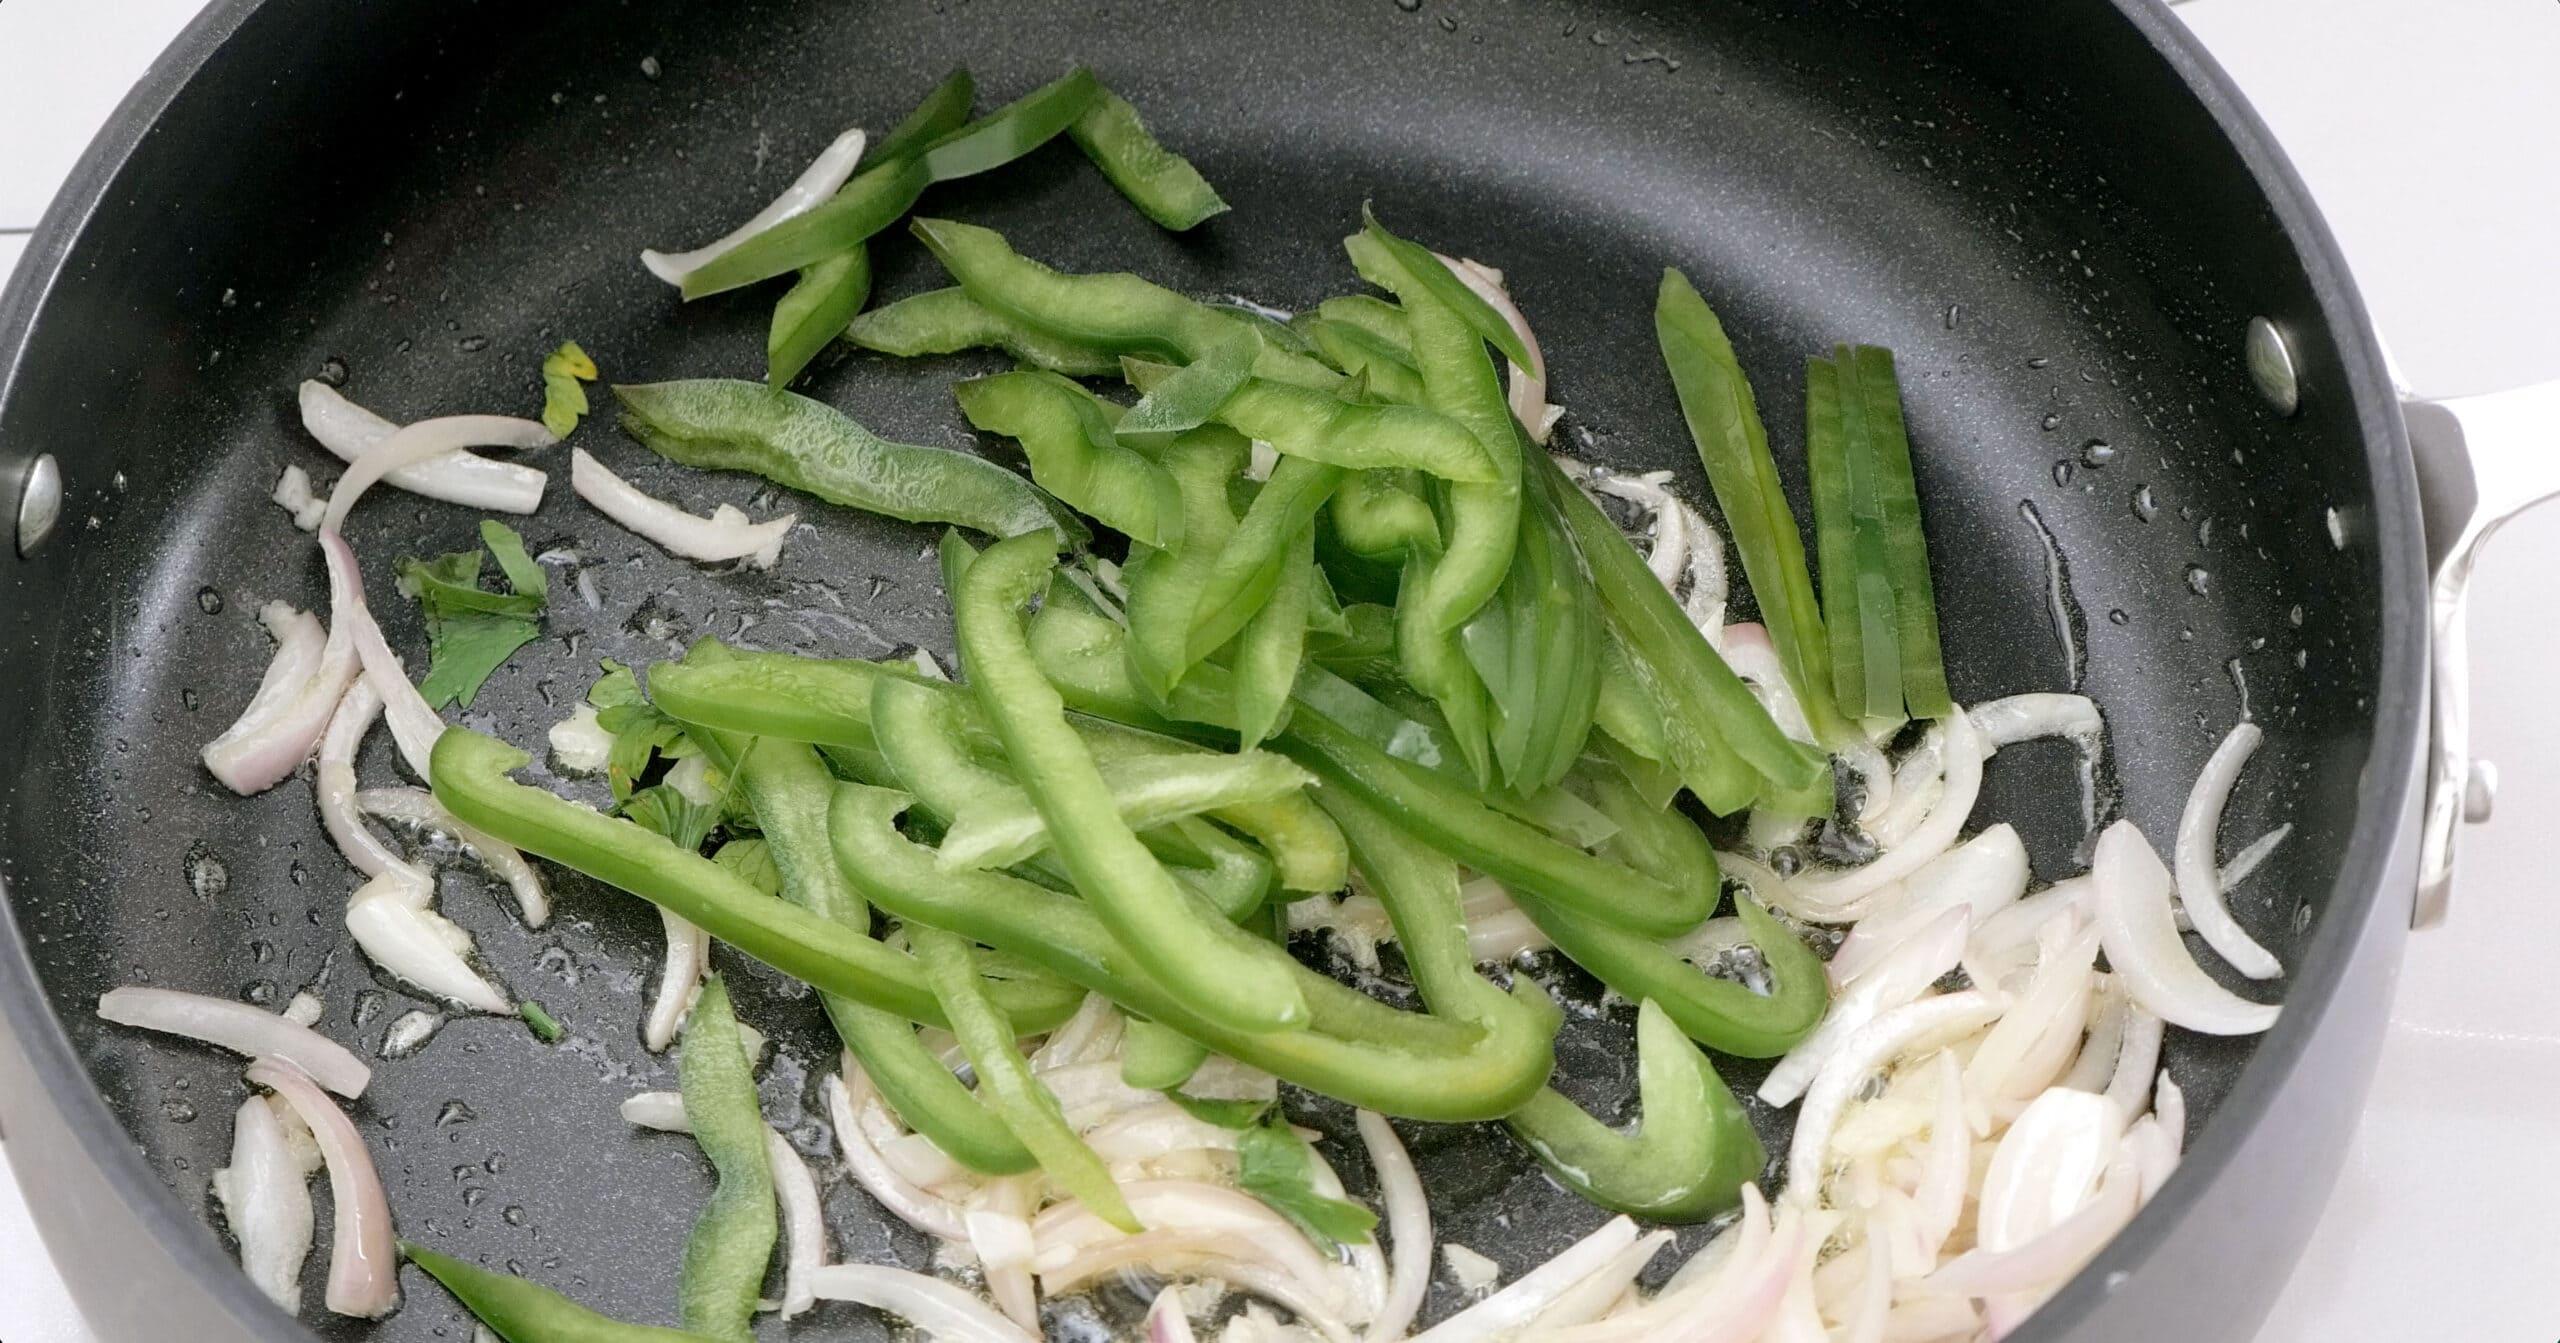 Sauteing sazón ingredients